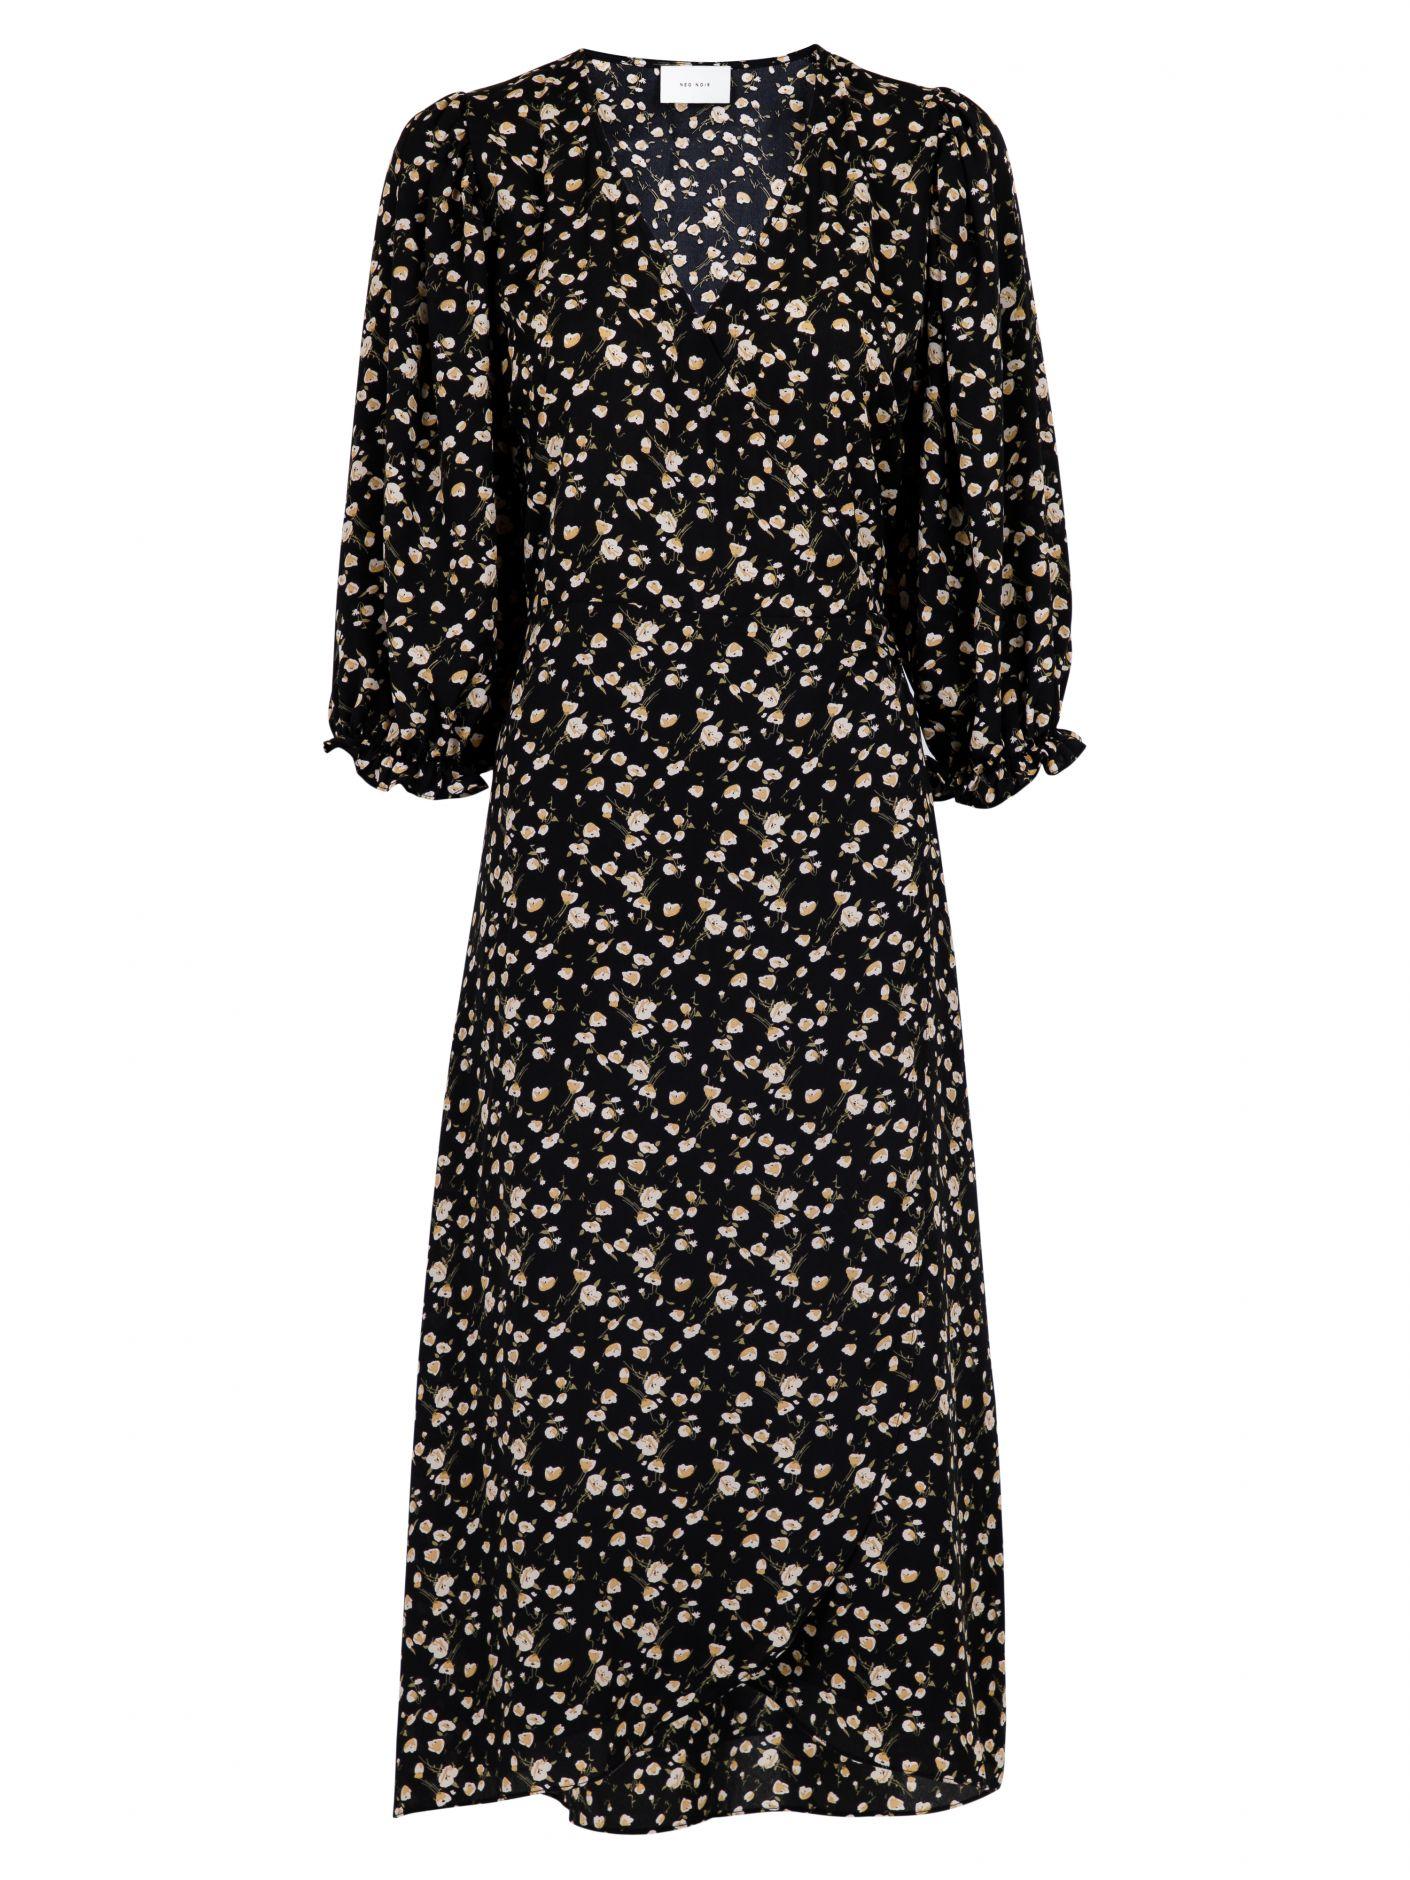 Neo Noir Carisma Flower kjole